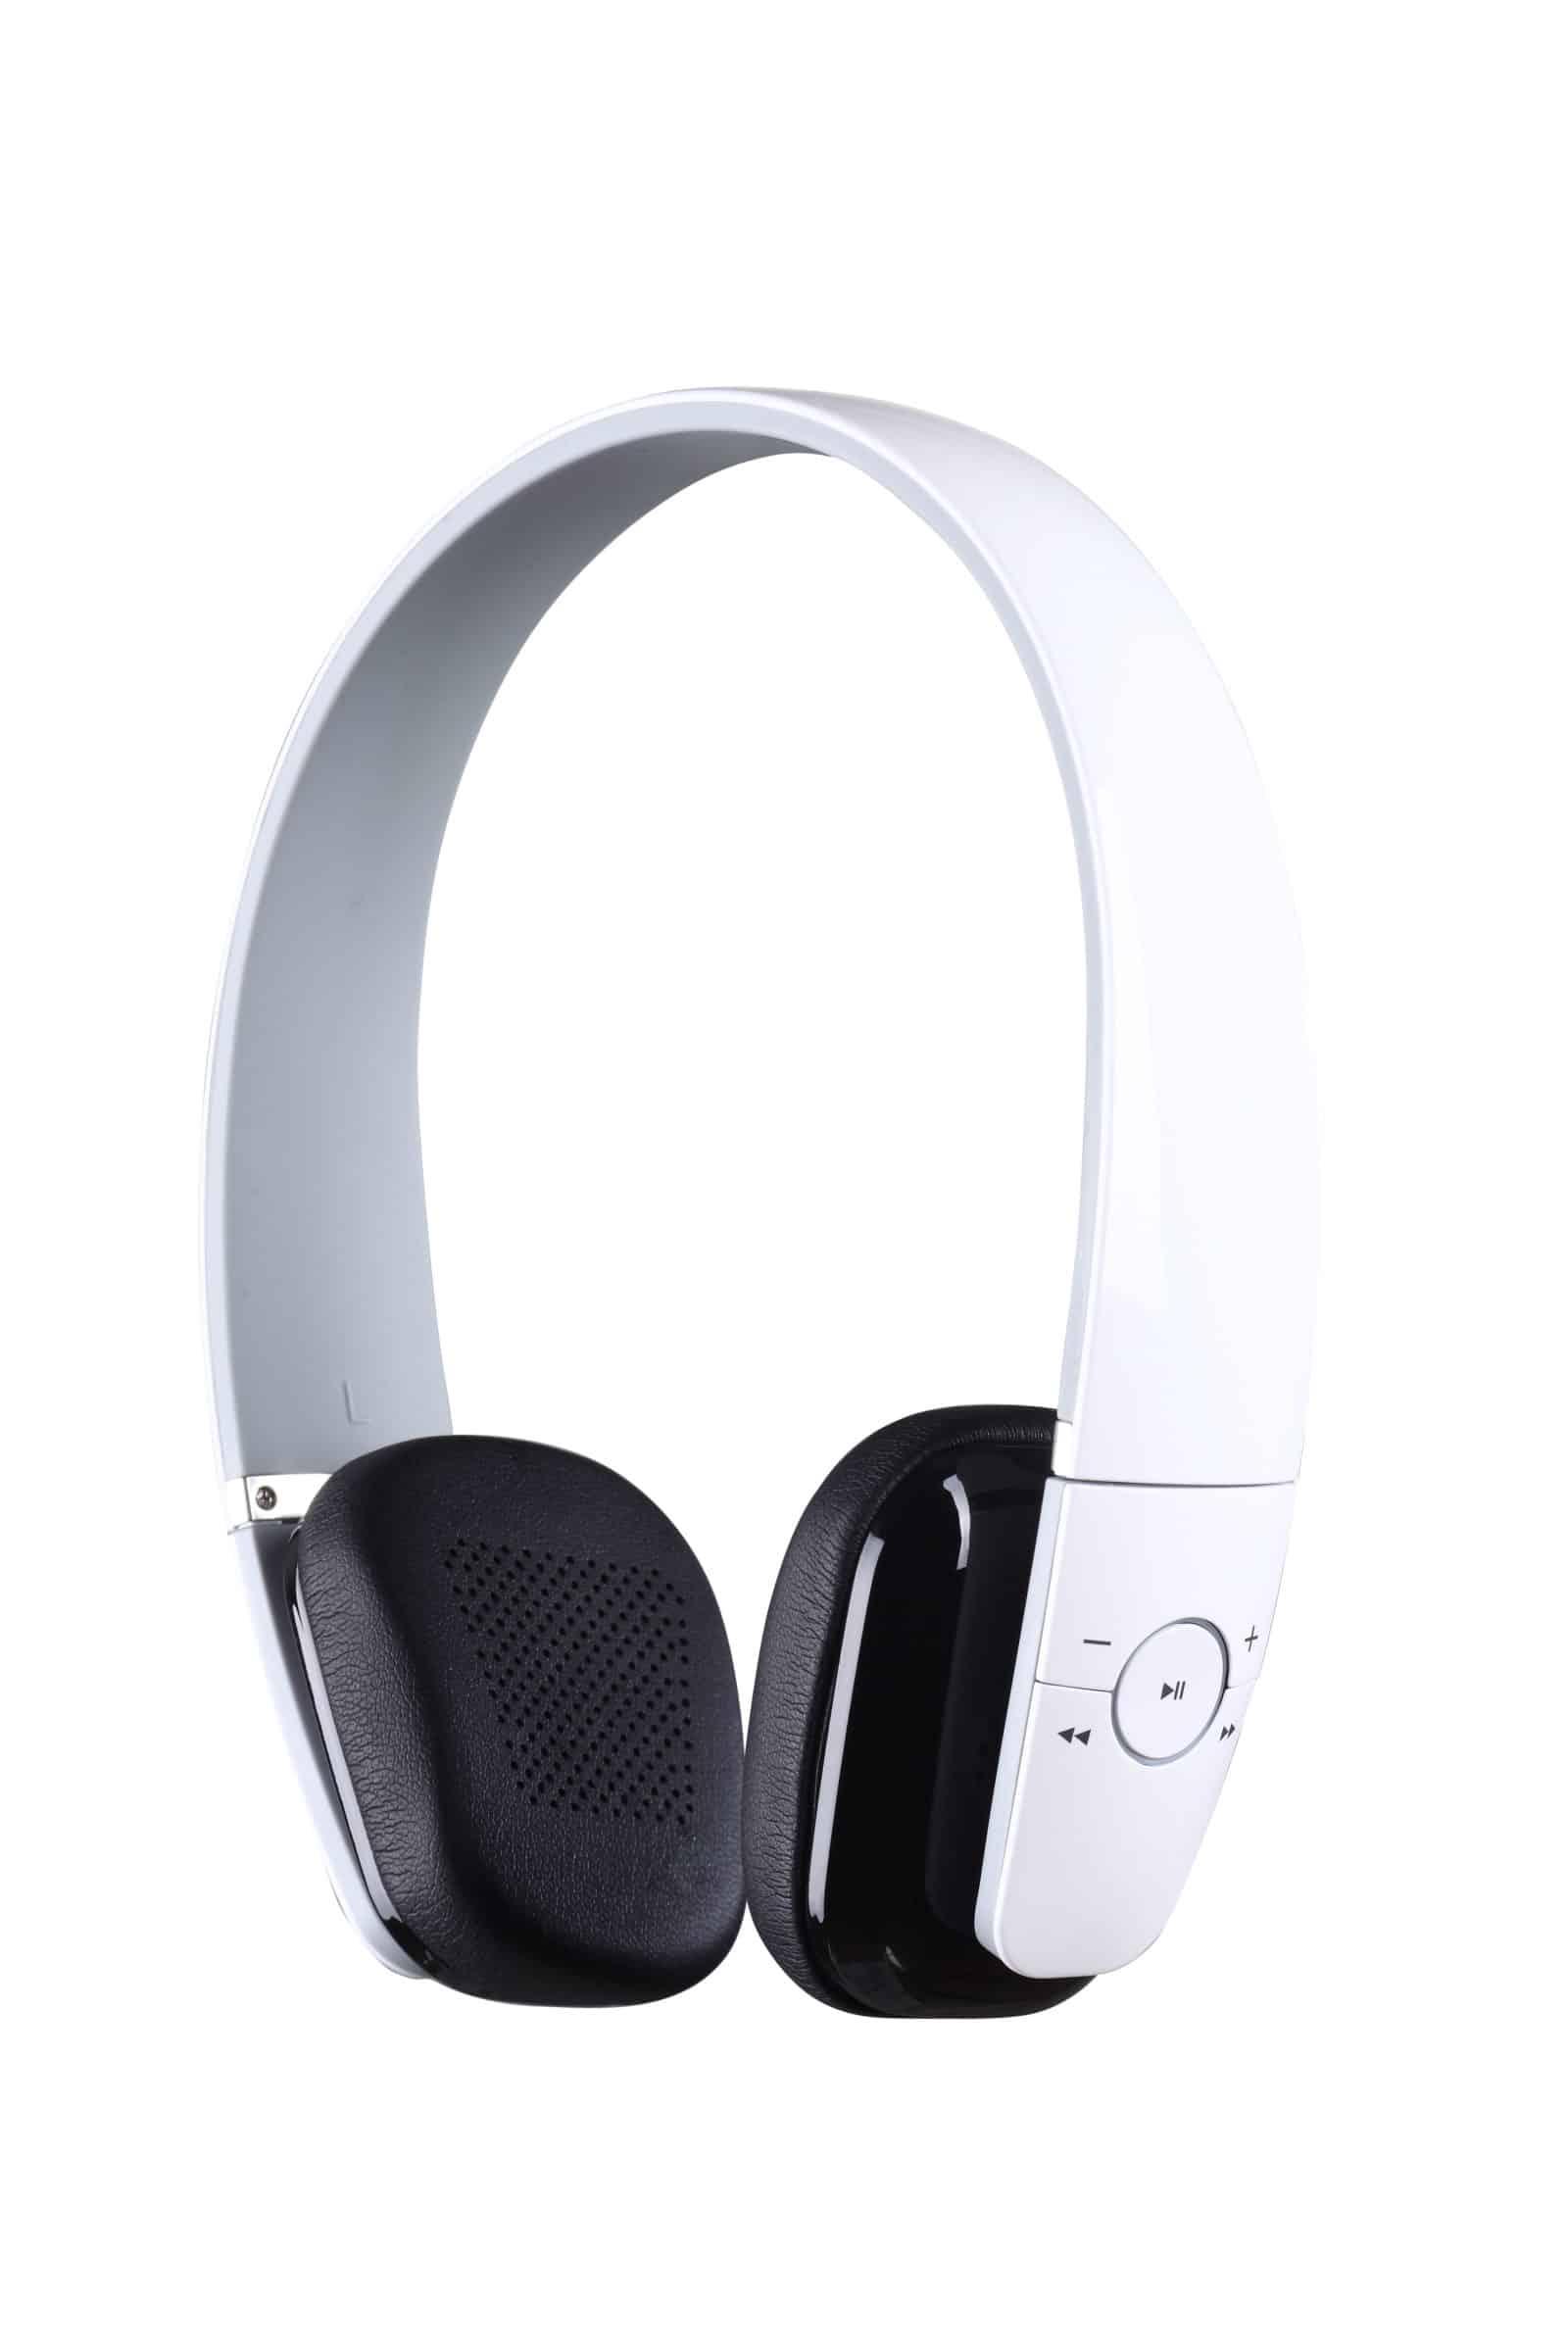 UMi headphones 2015_1